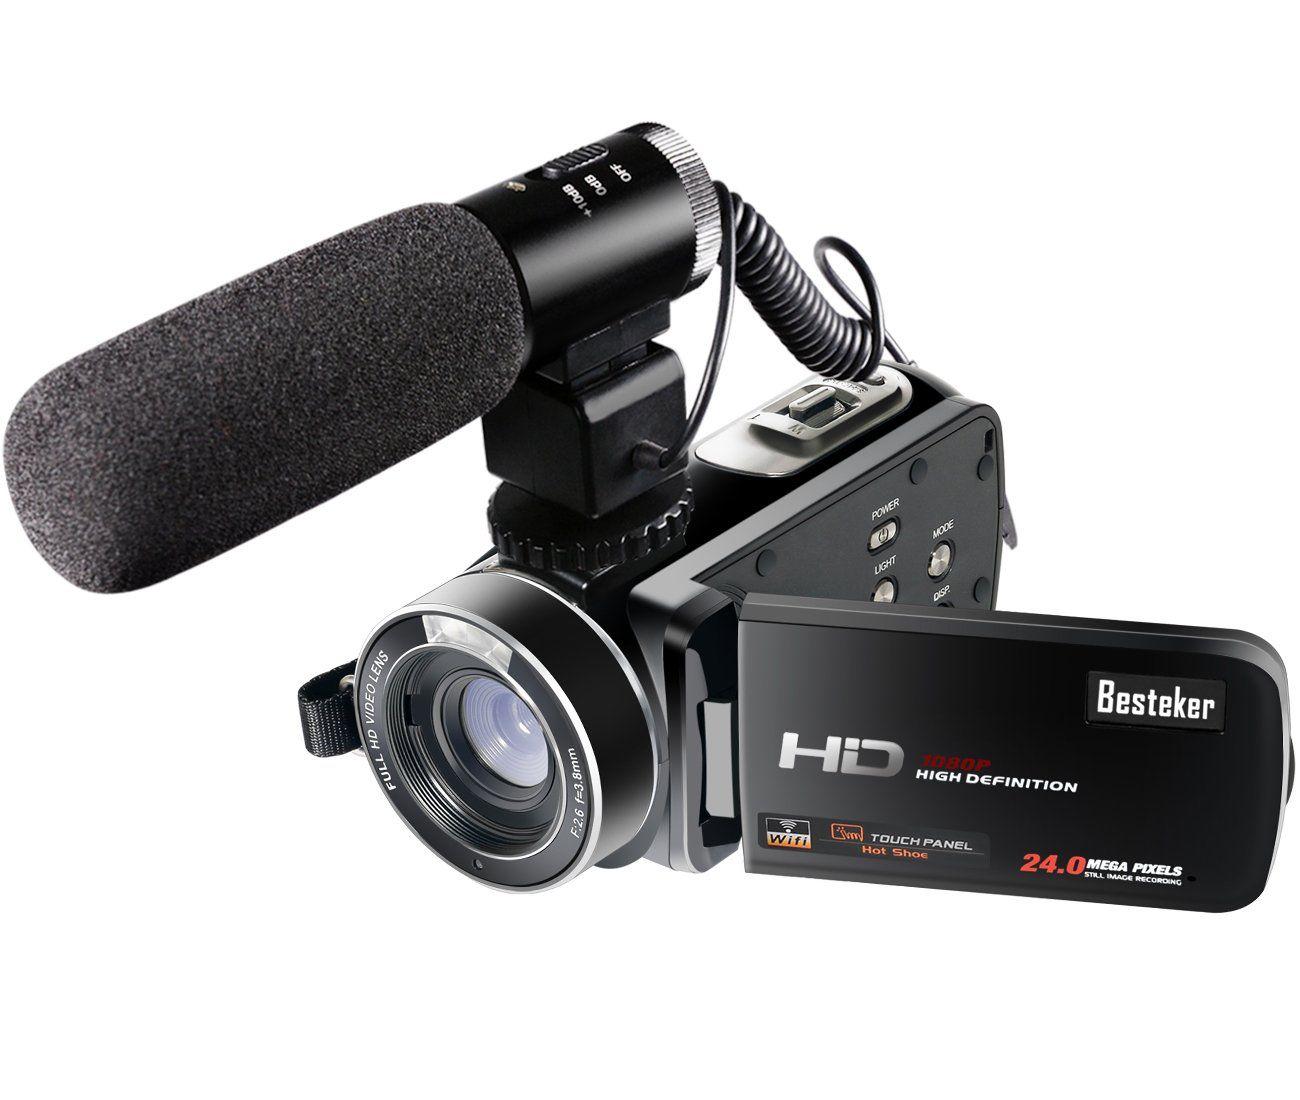 Besteker Wifi Camcorder Full Hd 1080p 30fps Portable Digital Video Camera With External Microphone Hdv Z20 Digital Video Camera Video Camera Camcorder